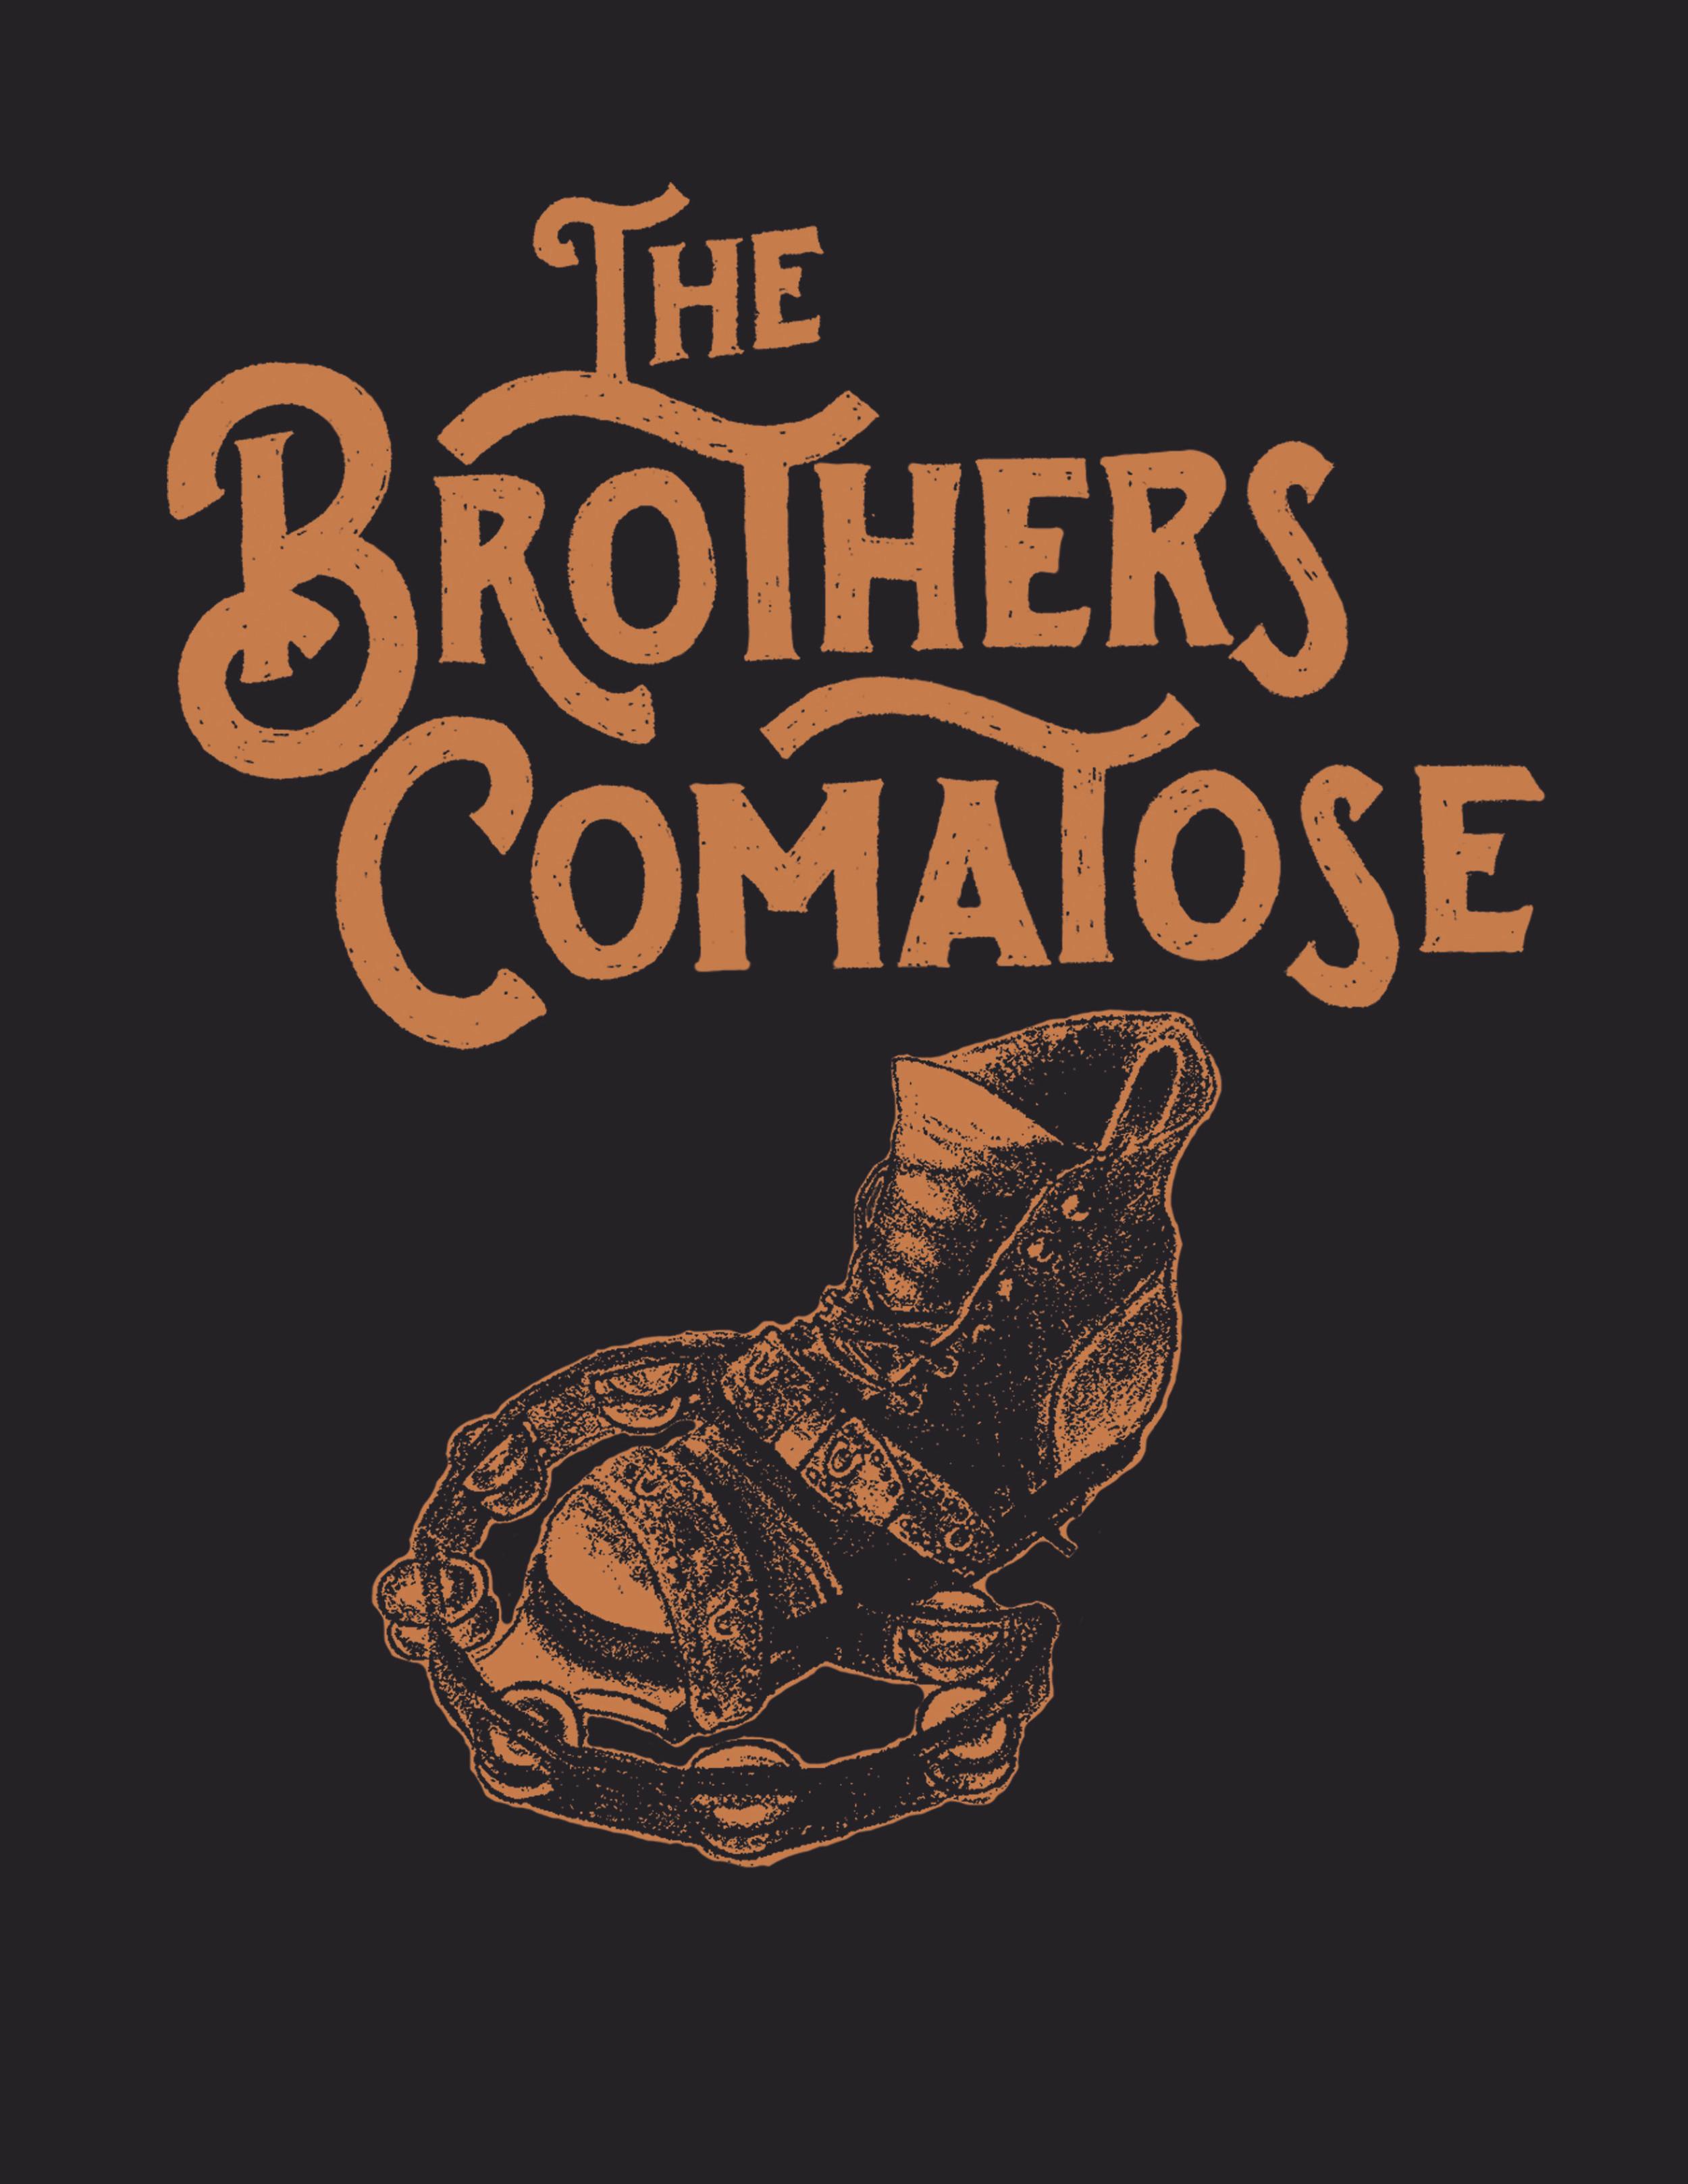 Brothers Comatose foot tambo logo.jpg